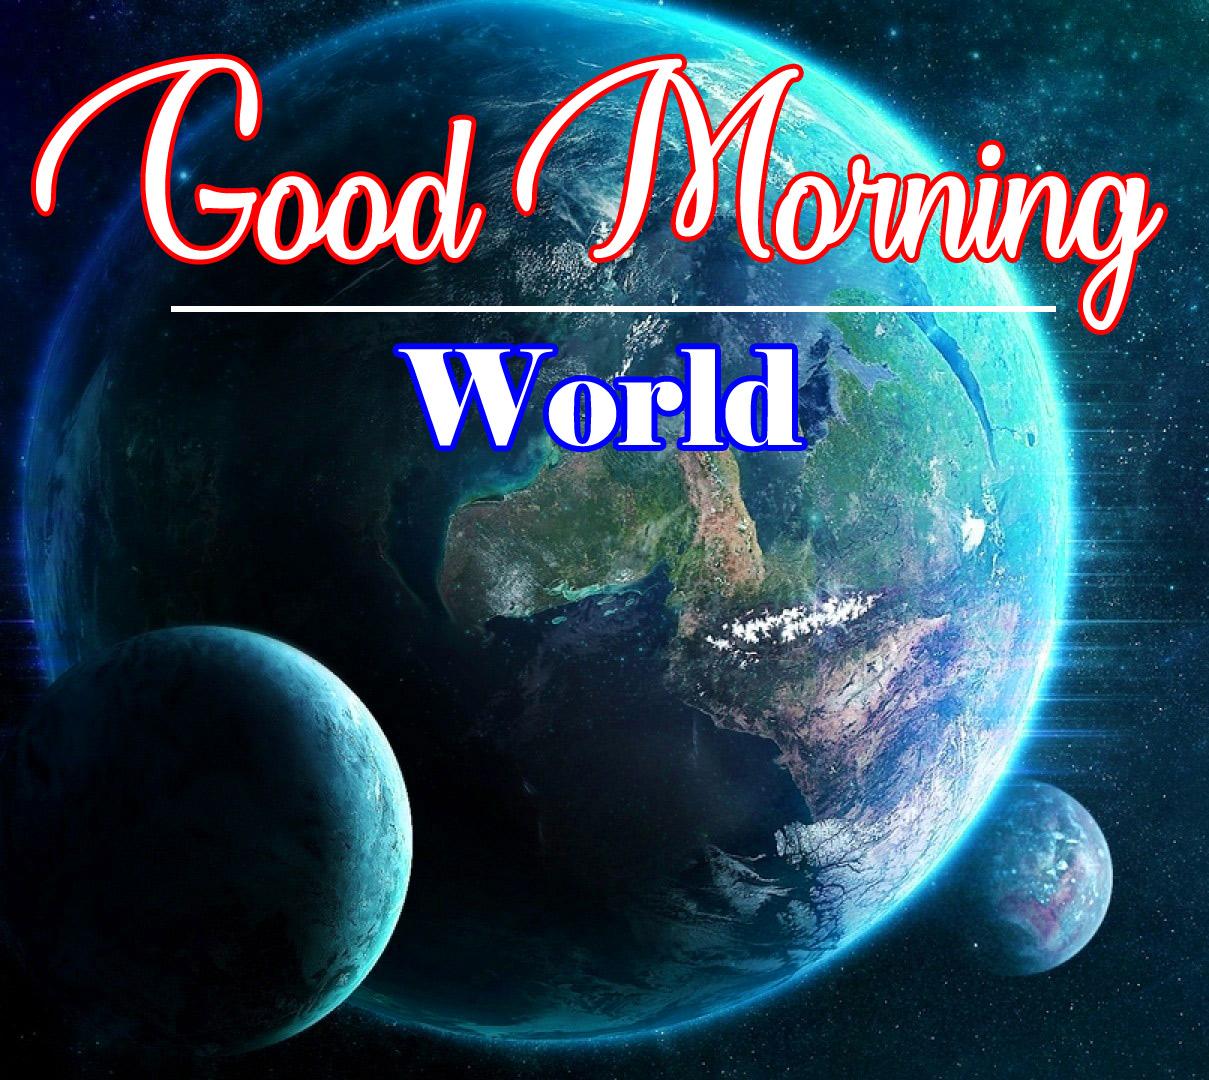 world good morning Images 10